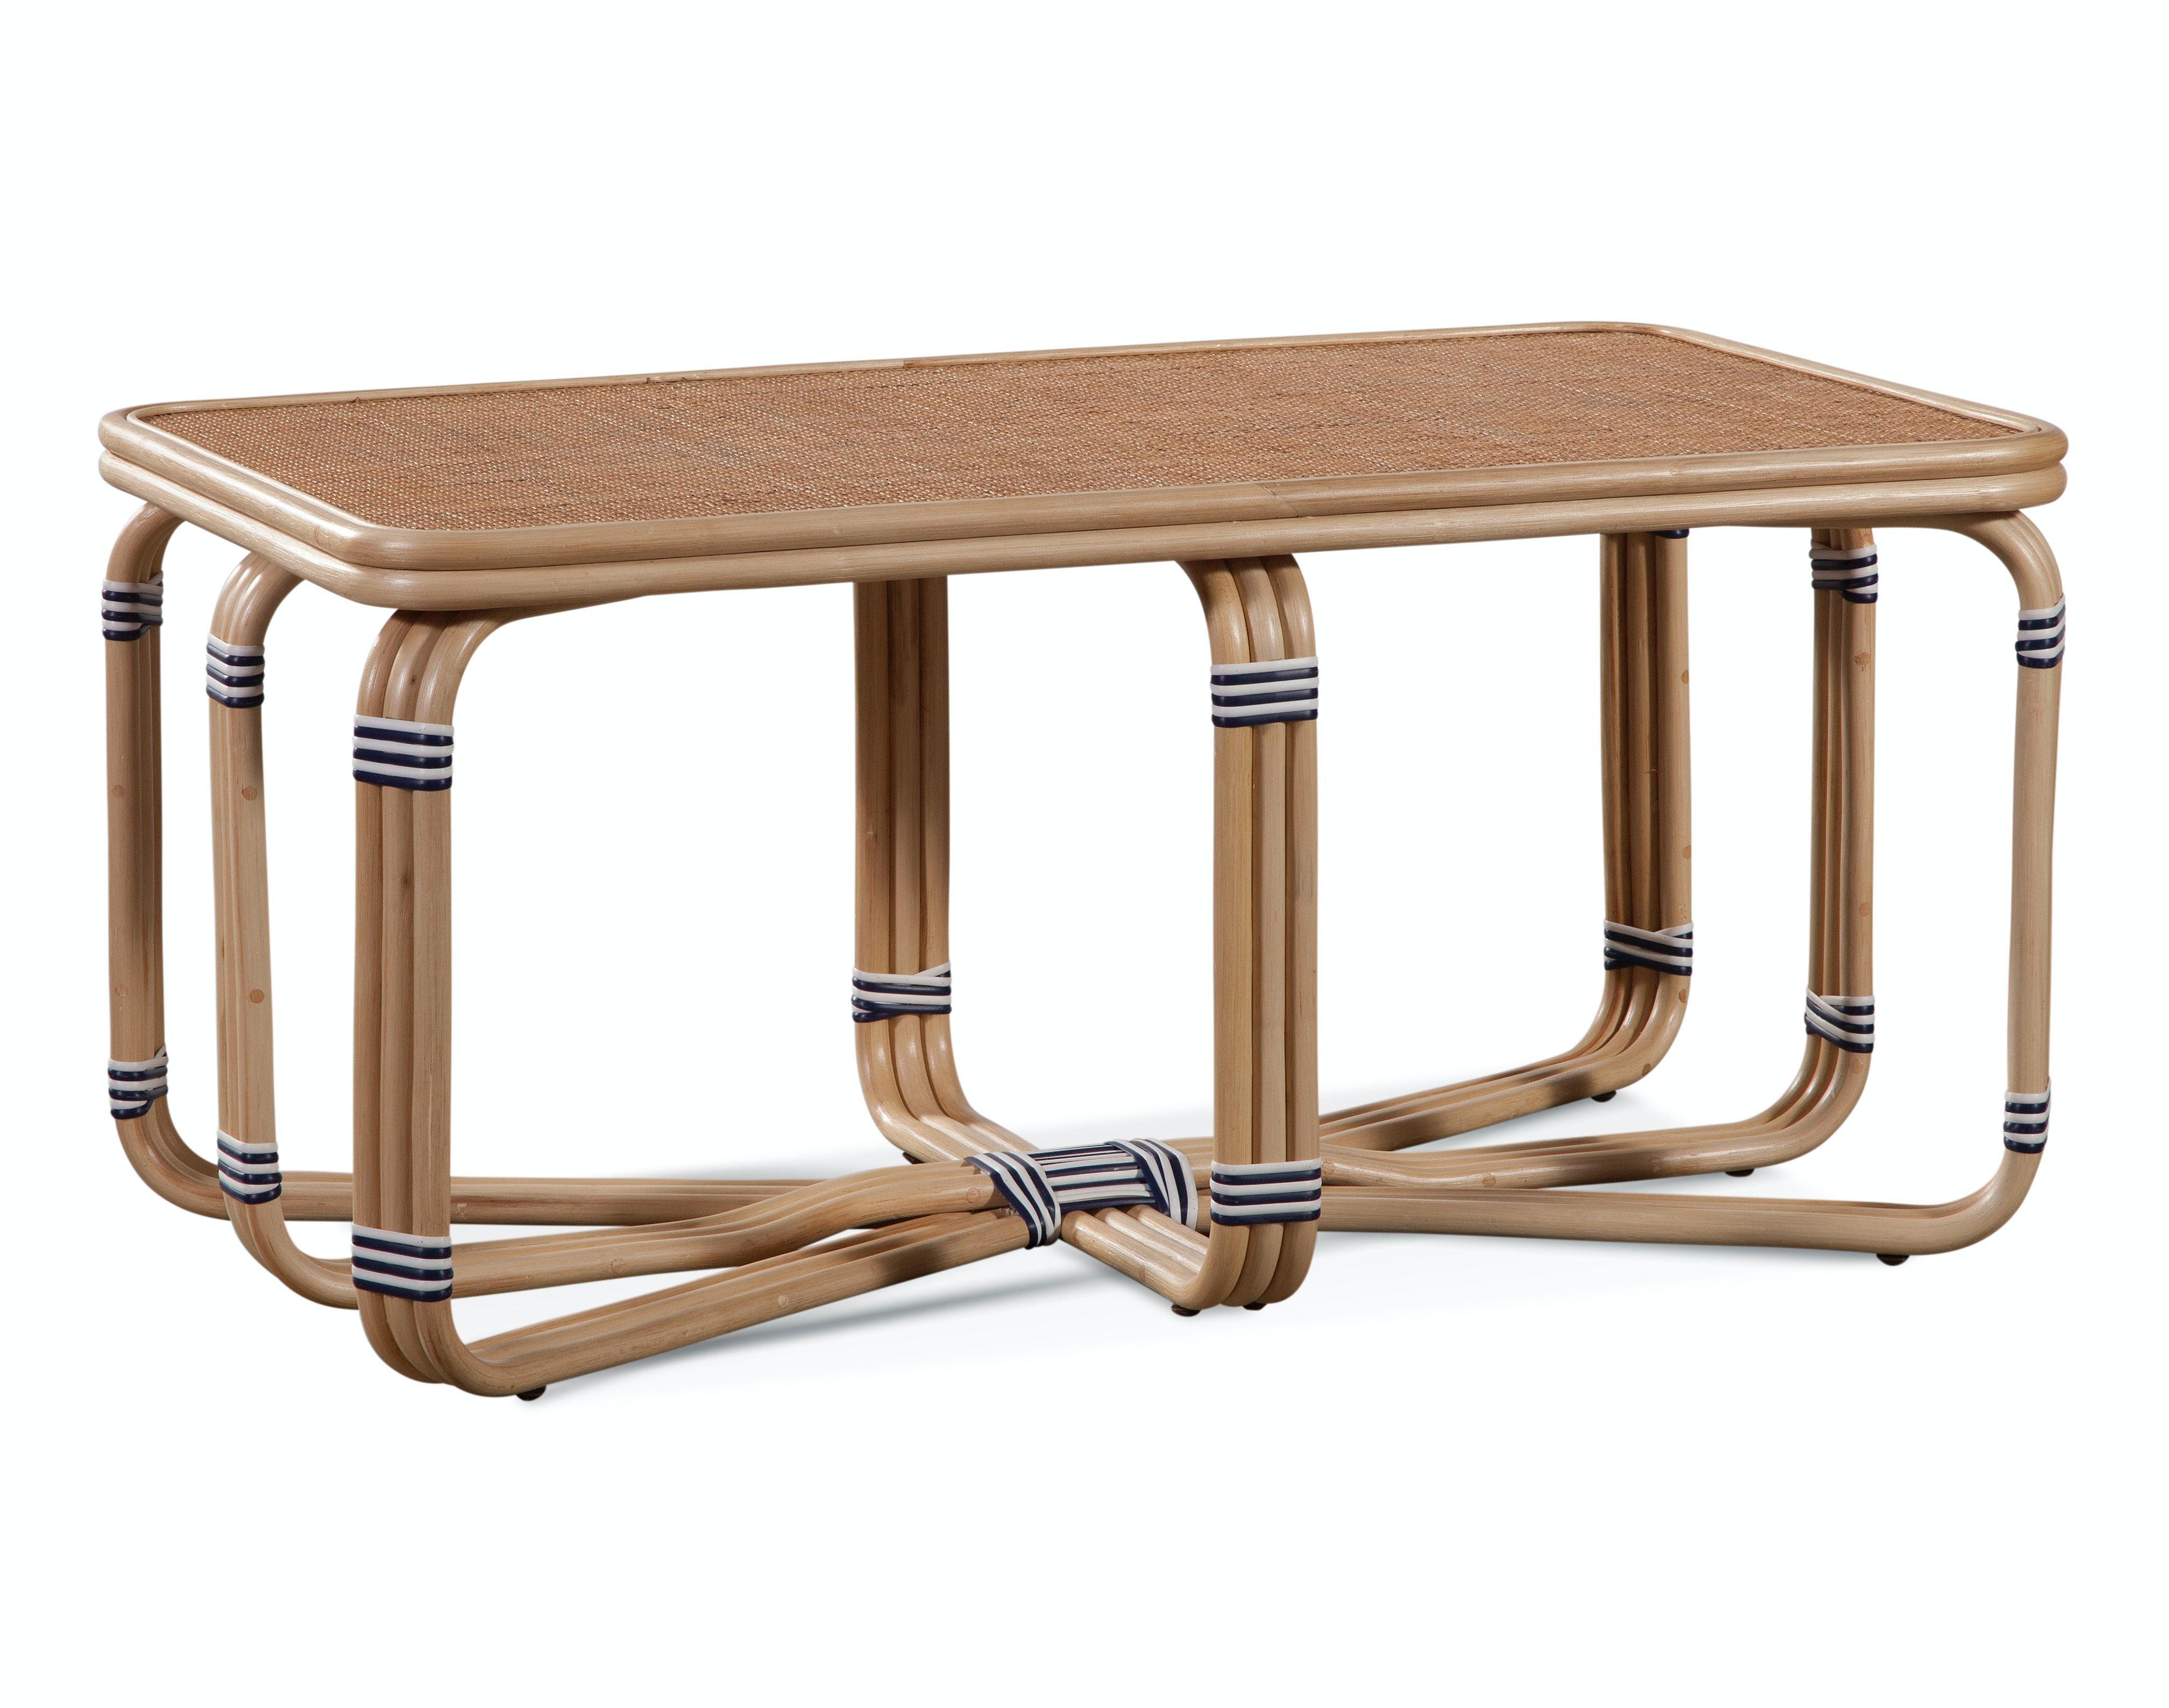 Seabrook Coffee Table 2913-072